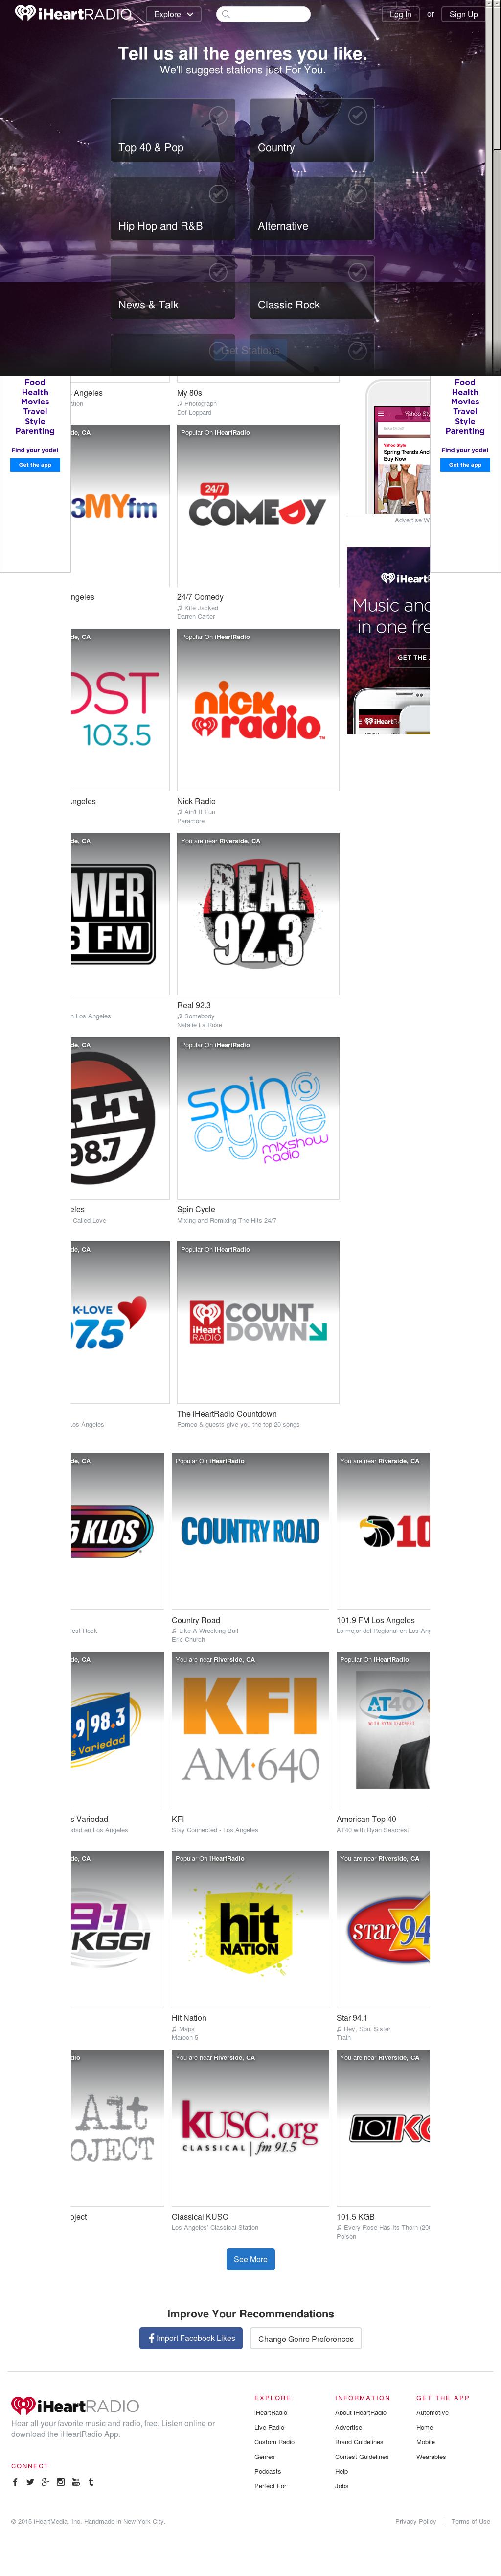 iHeartRadio Competitors, Revenue and Employees - Owler Company Profile